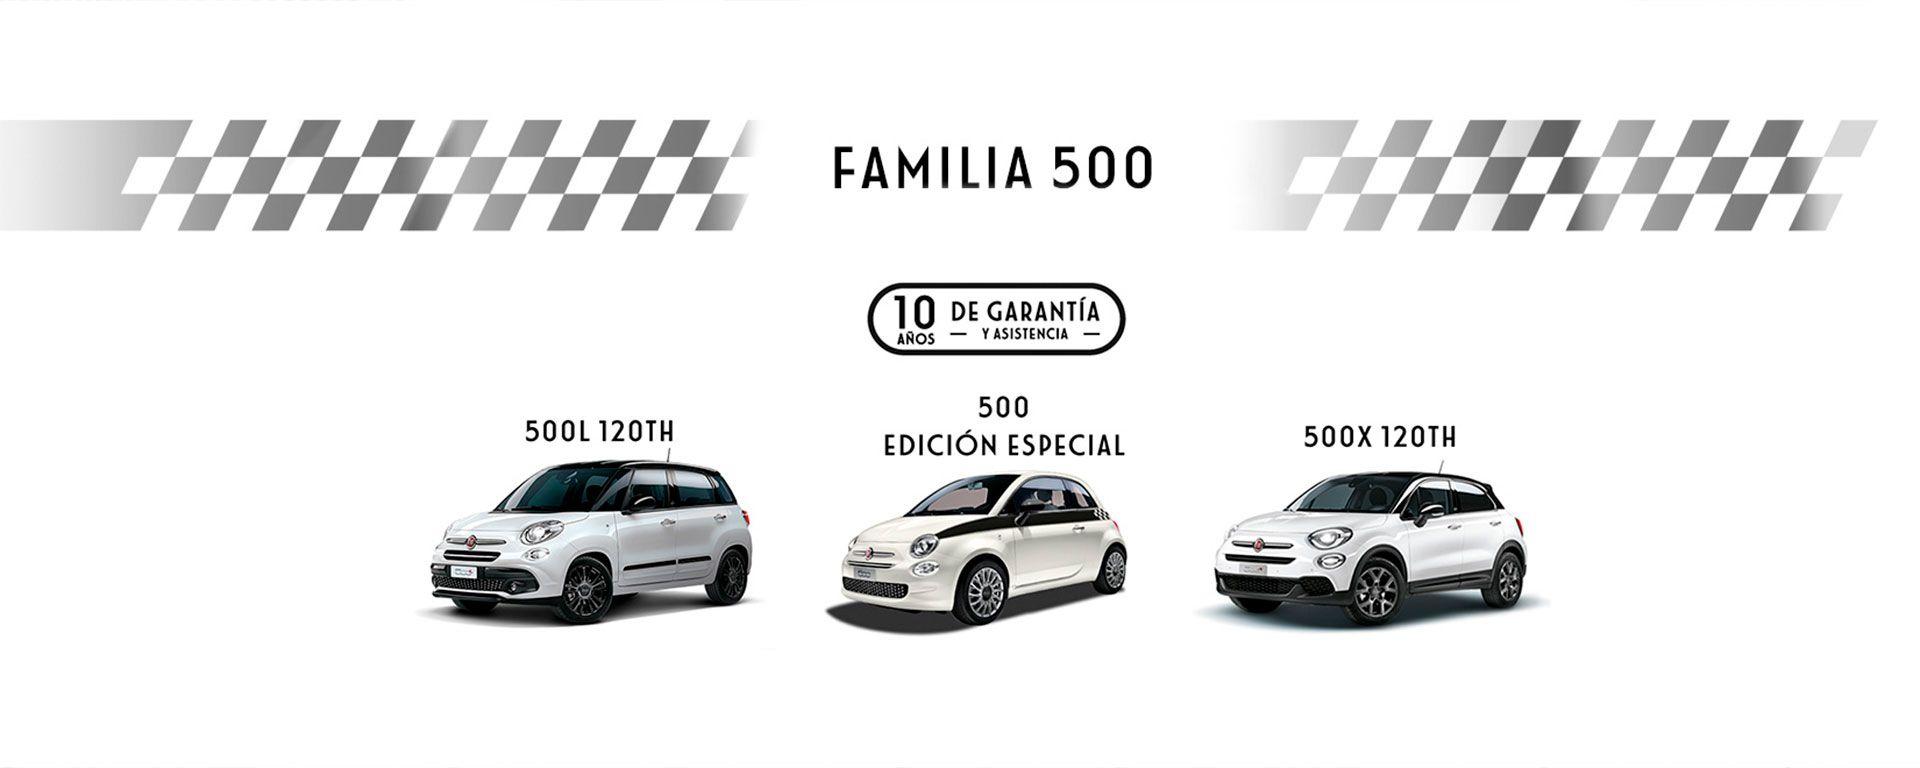 FAMILIA 500.